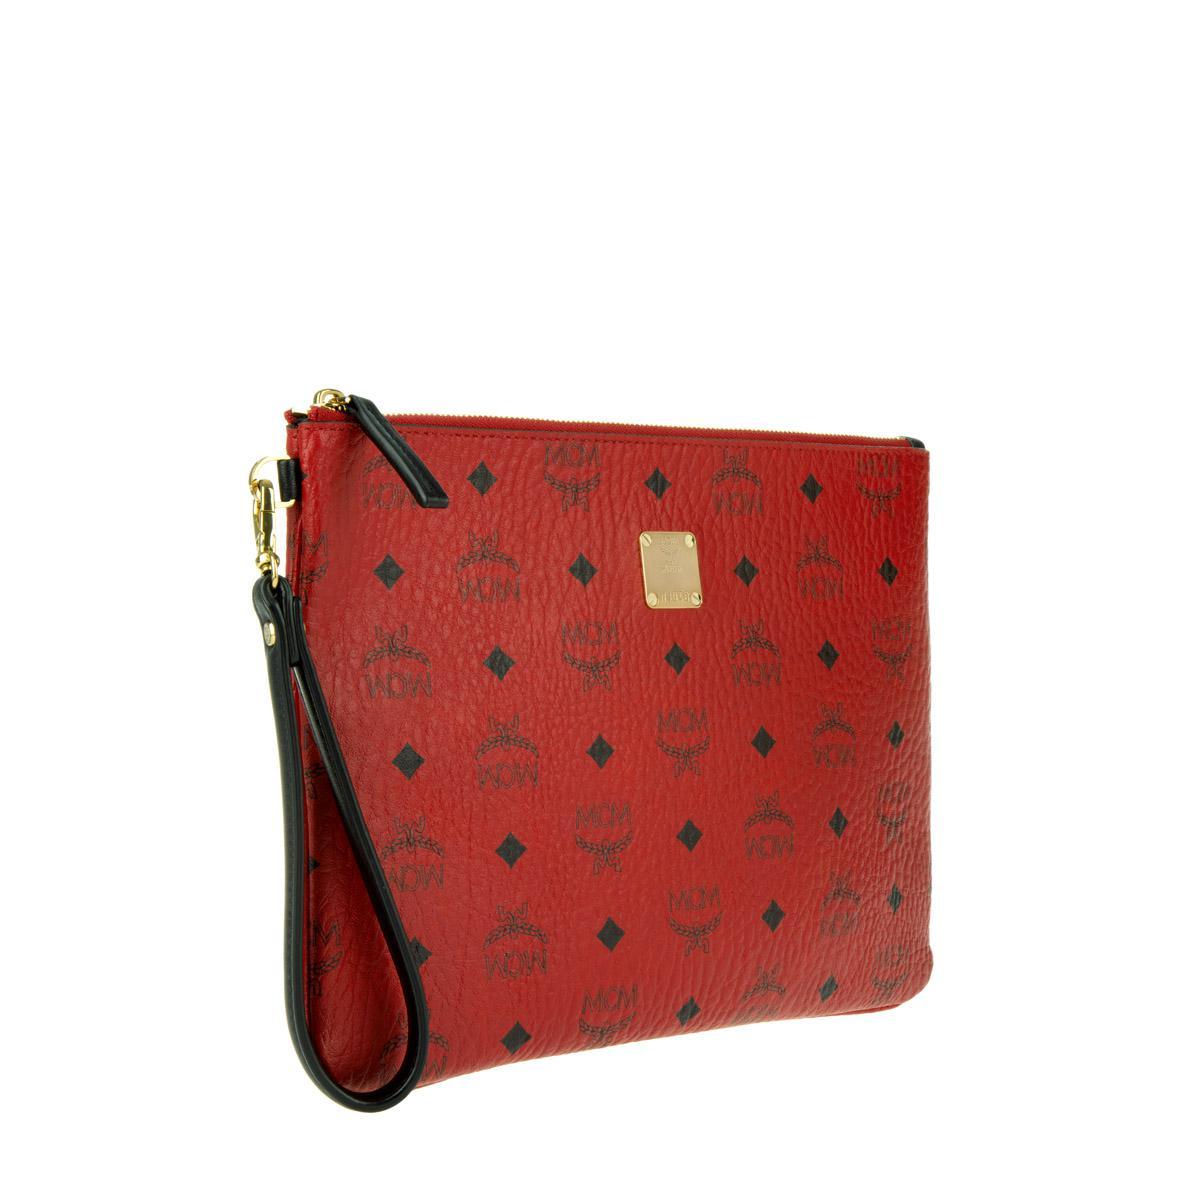 54c2d13210fc9 MCM Stark Top Zip Medium Pouch Ipad Bag Red in Red - Lyst